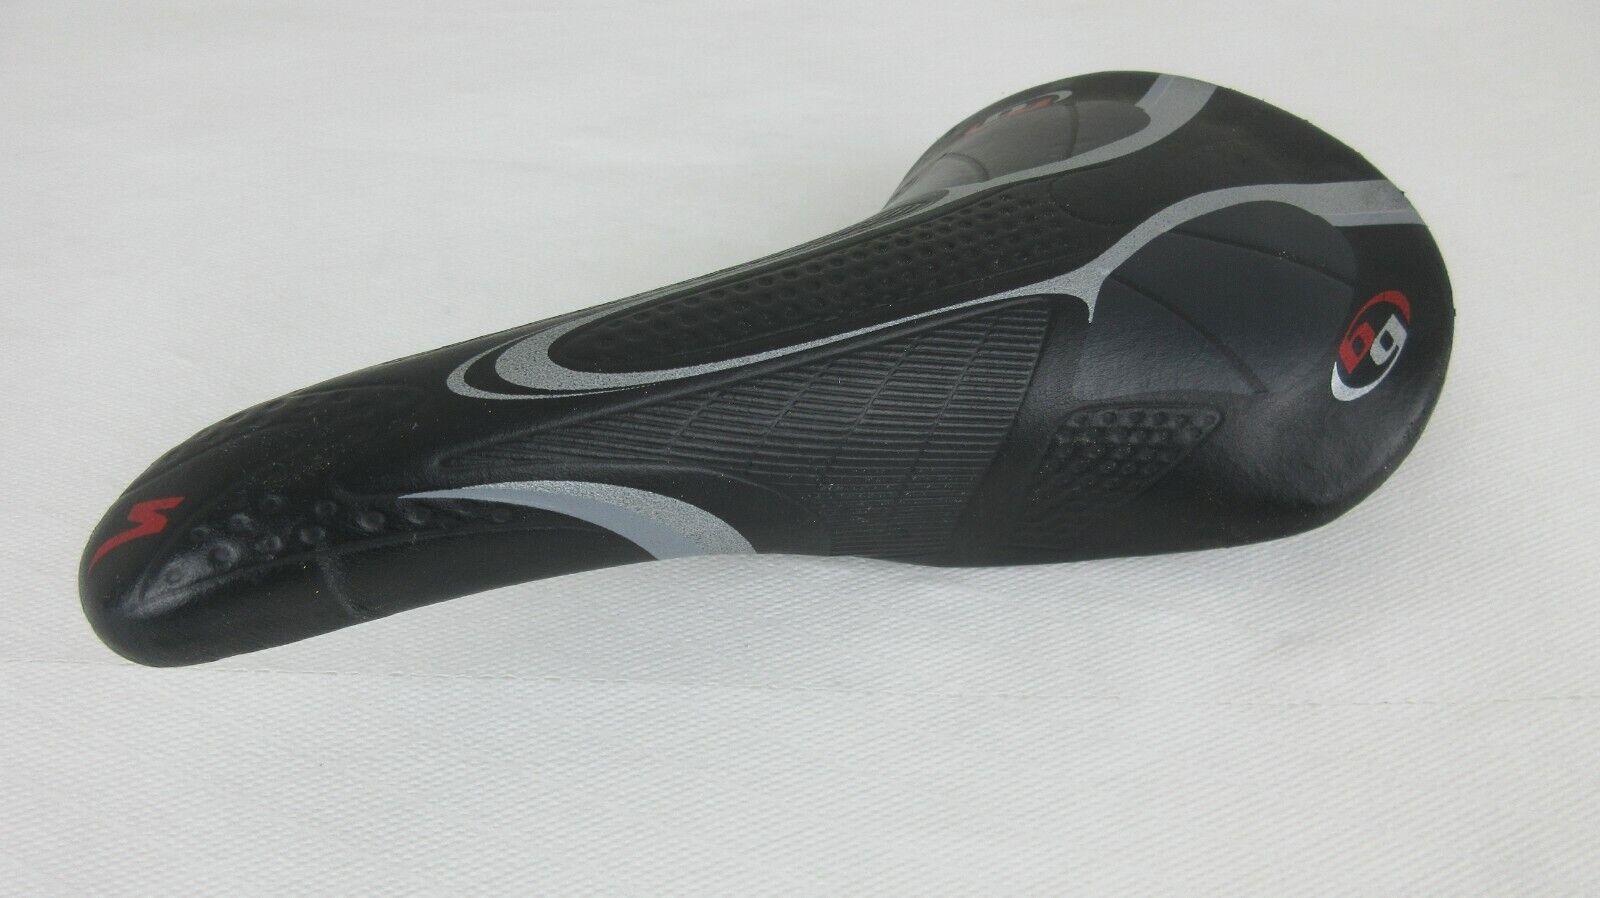 Selle San Marco GG Titanium Saddle, Specialized